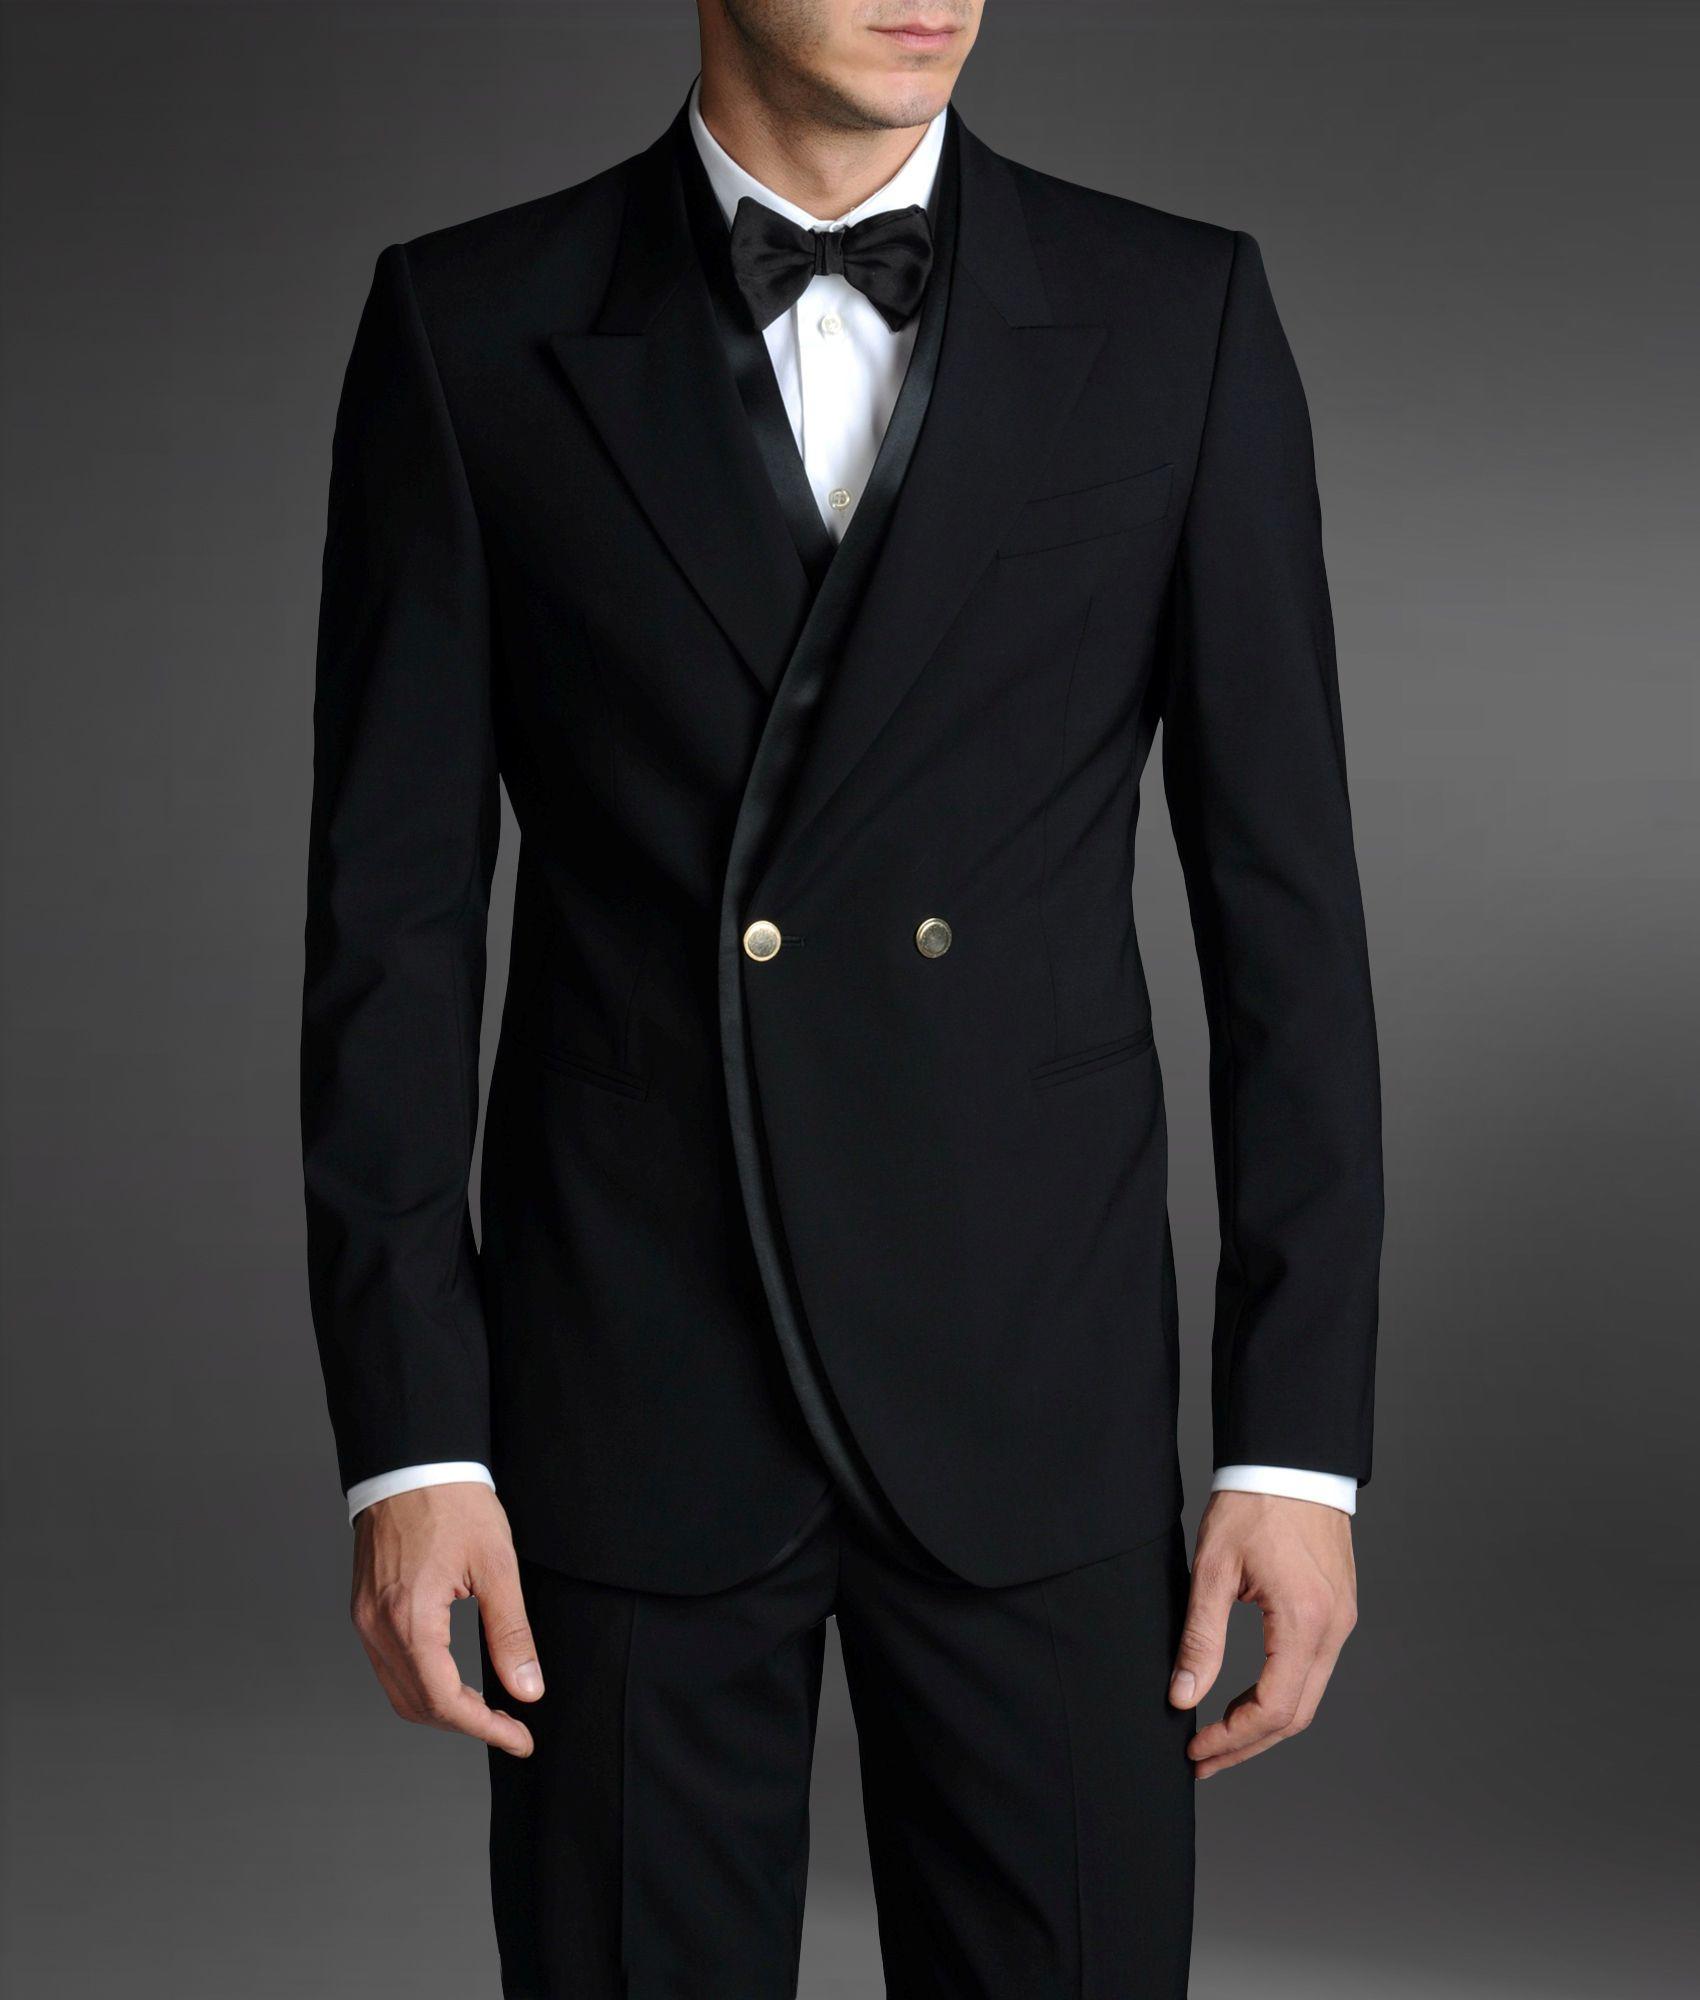 Tuxedo: Emporio Armani Tuxedo Jacket With Peak Lapels In Black For